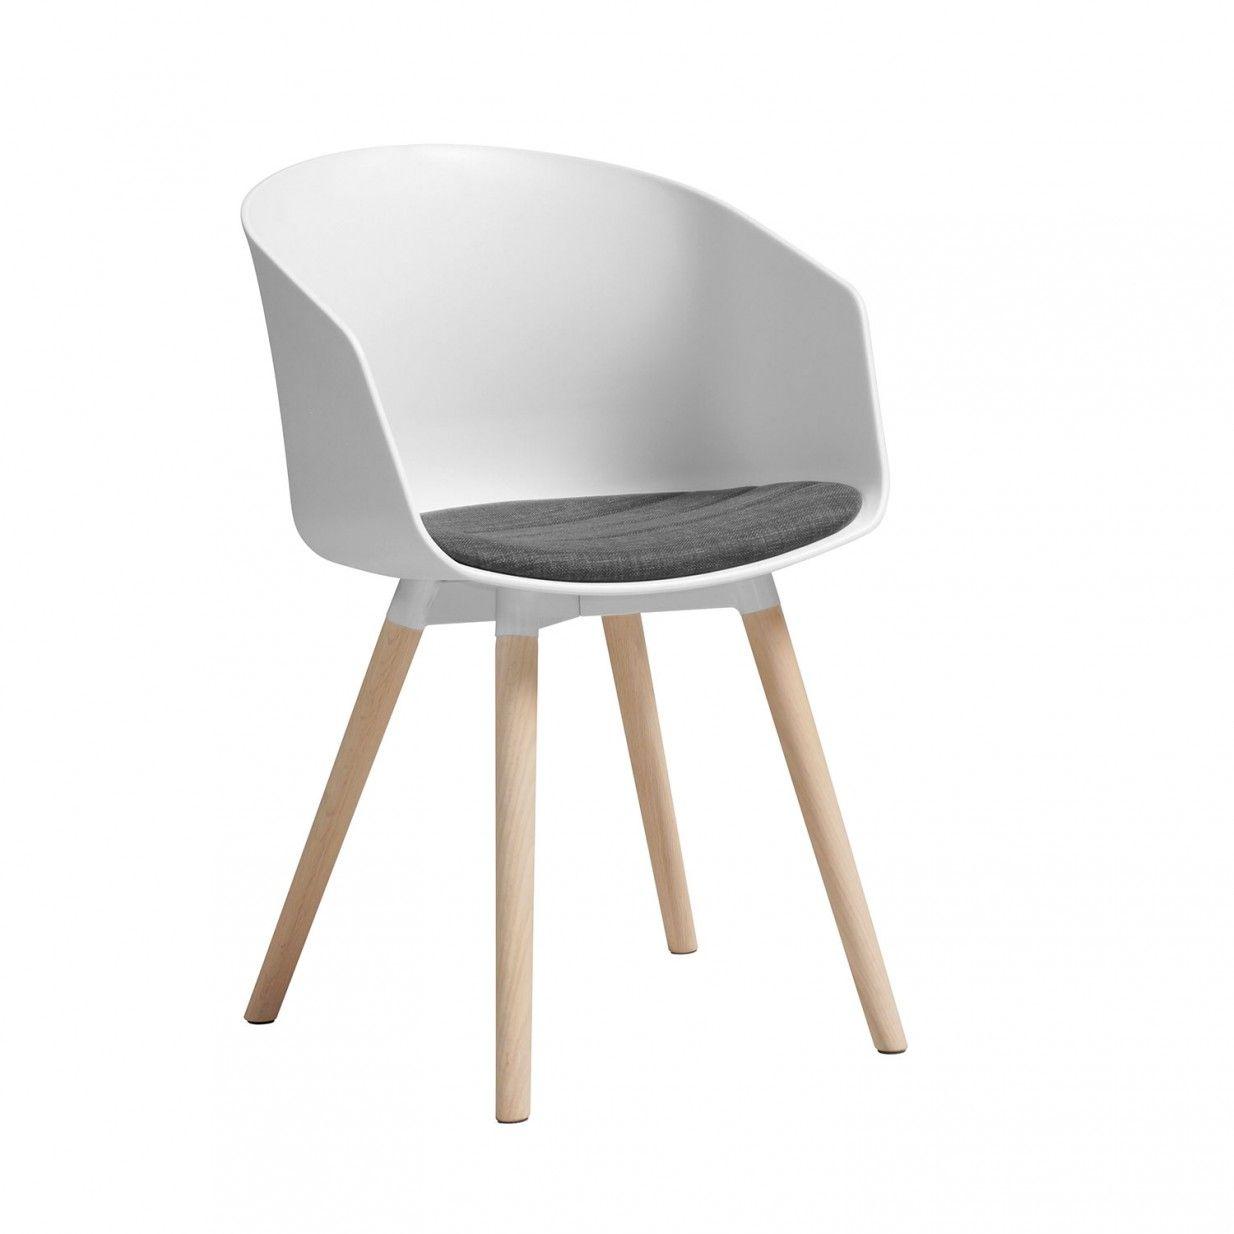 Moon Stuhl - Dunkelgrau/Weiß | Interstil | Stühle | Pinterest ...